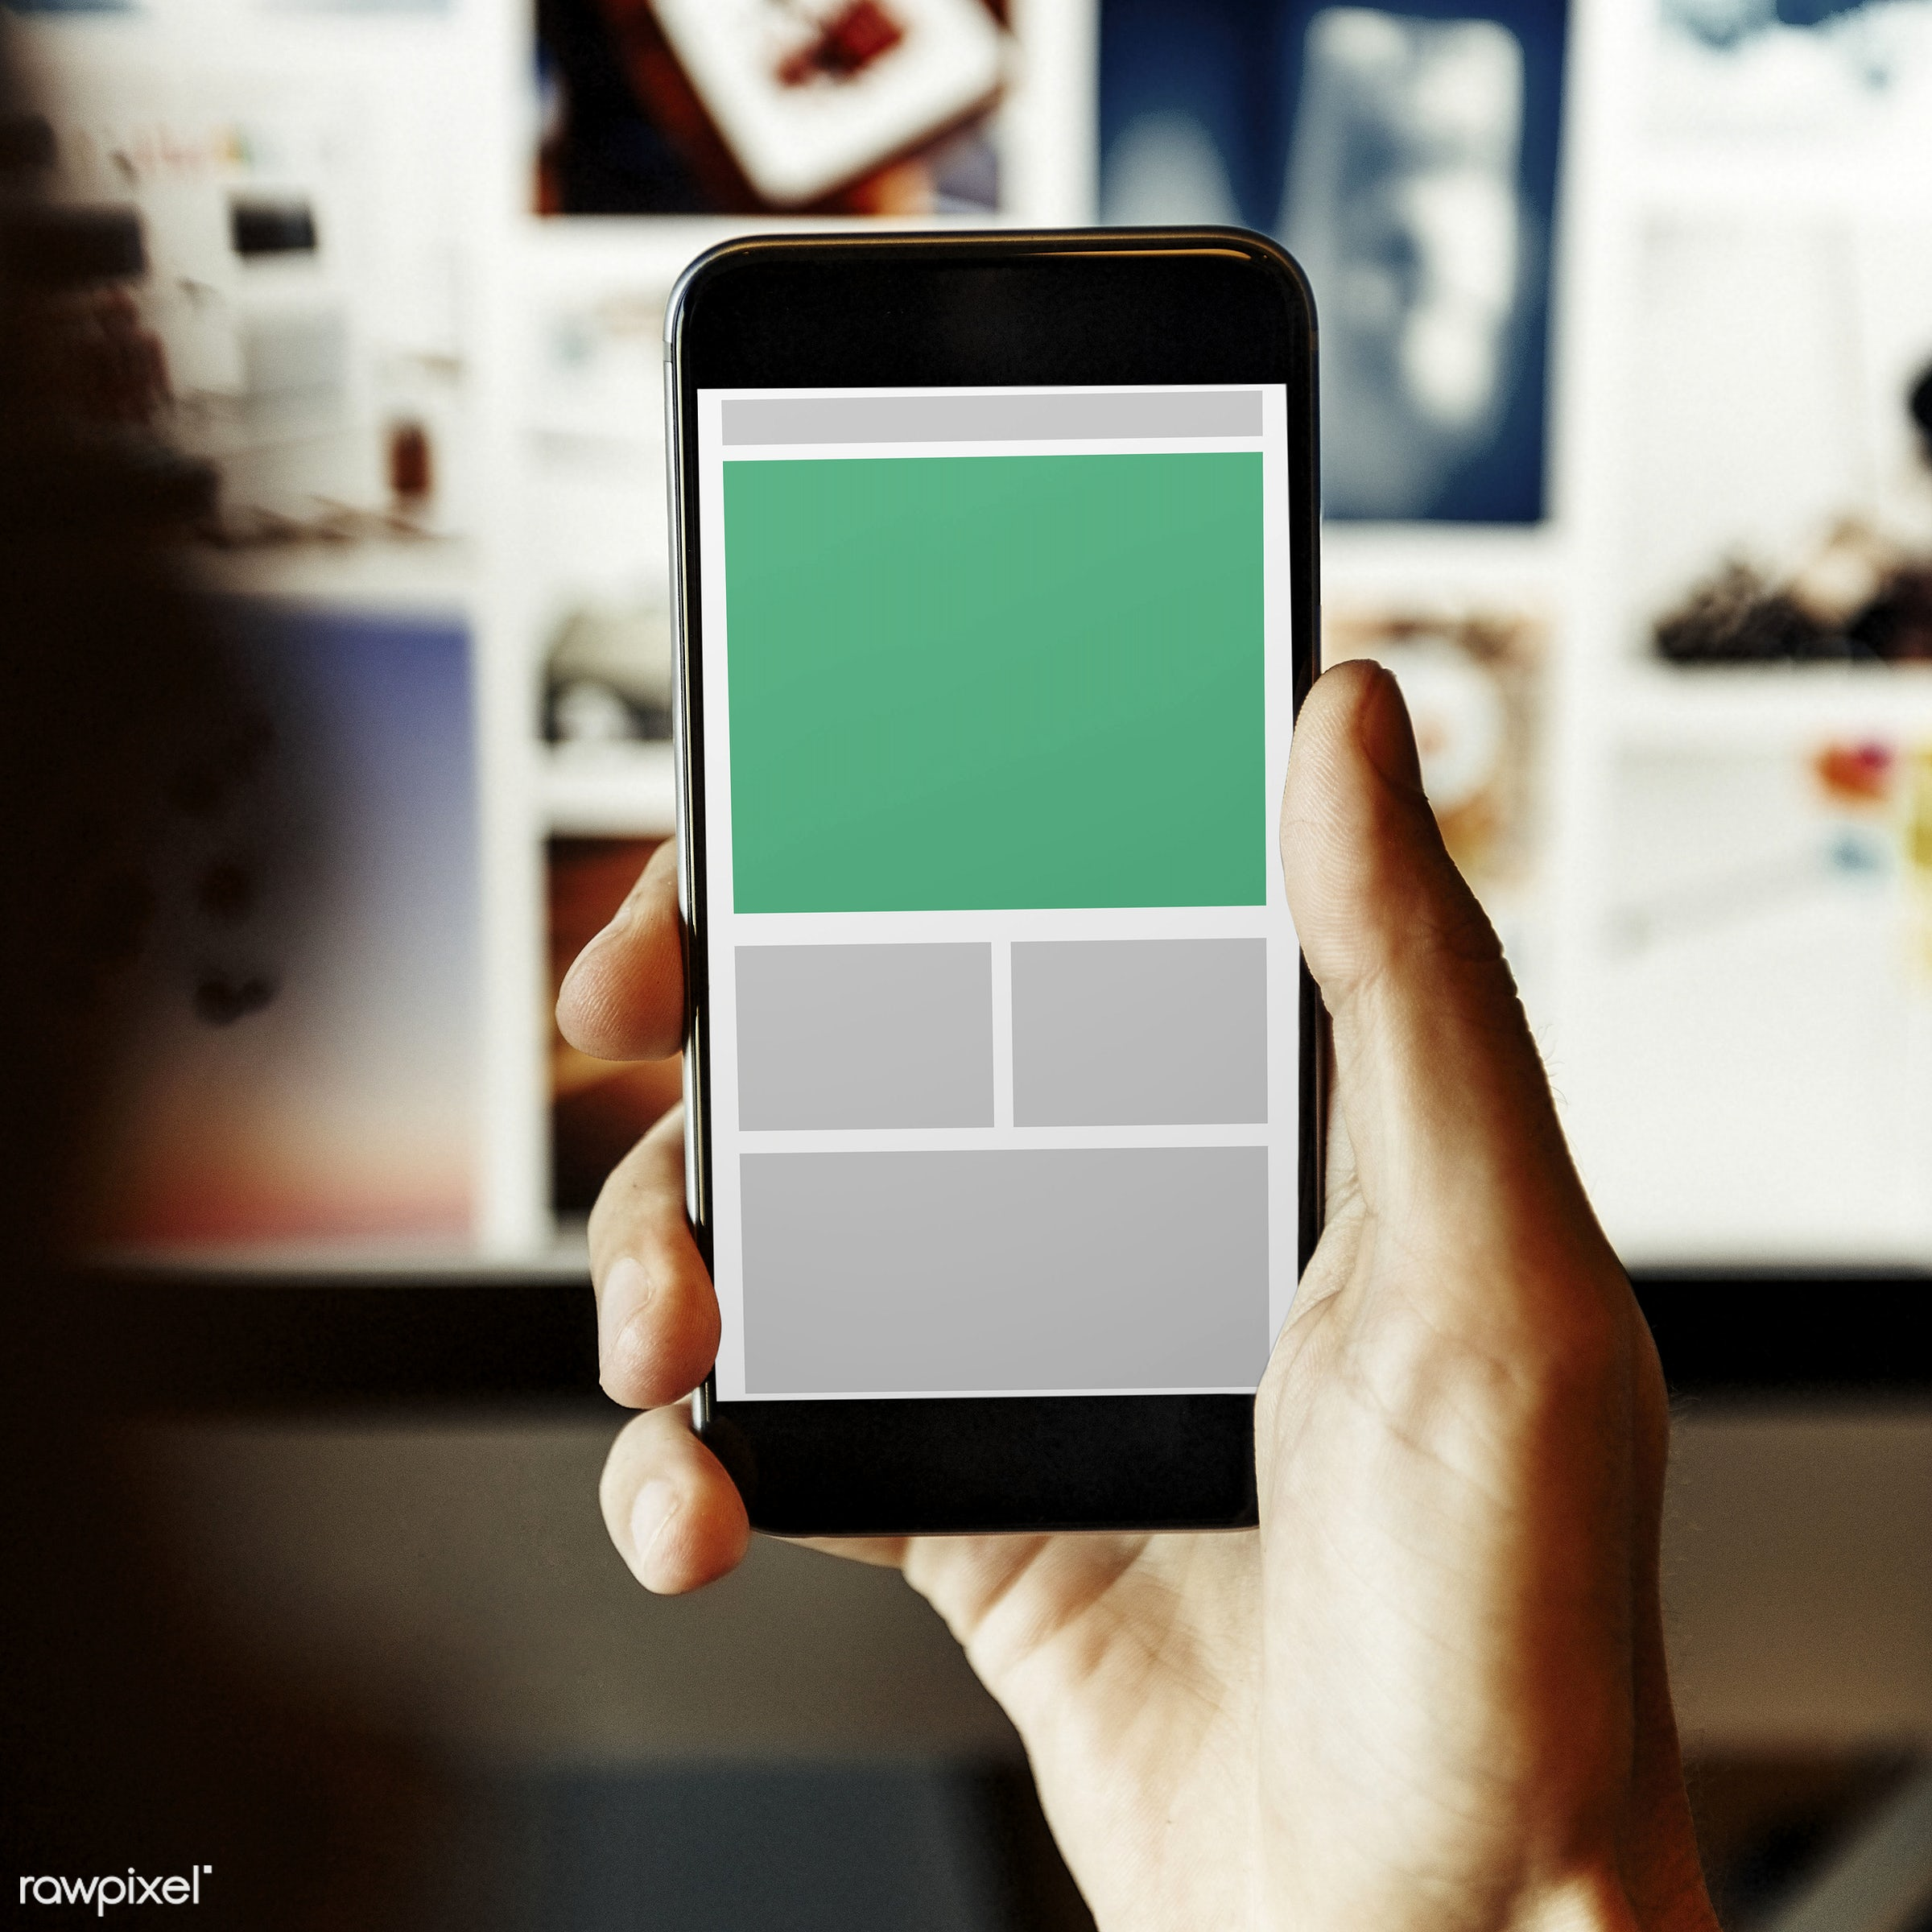 blank, blog, browsing, code, communication, connect, content, copy space, design, development, digital device, domain, empty...